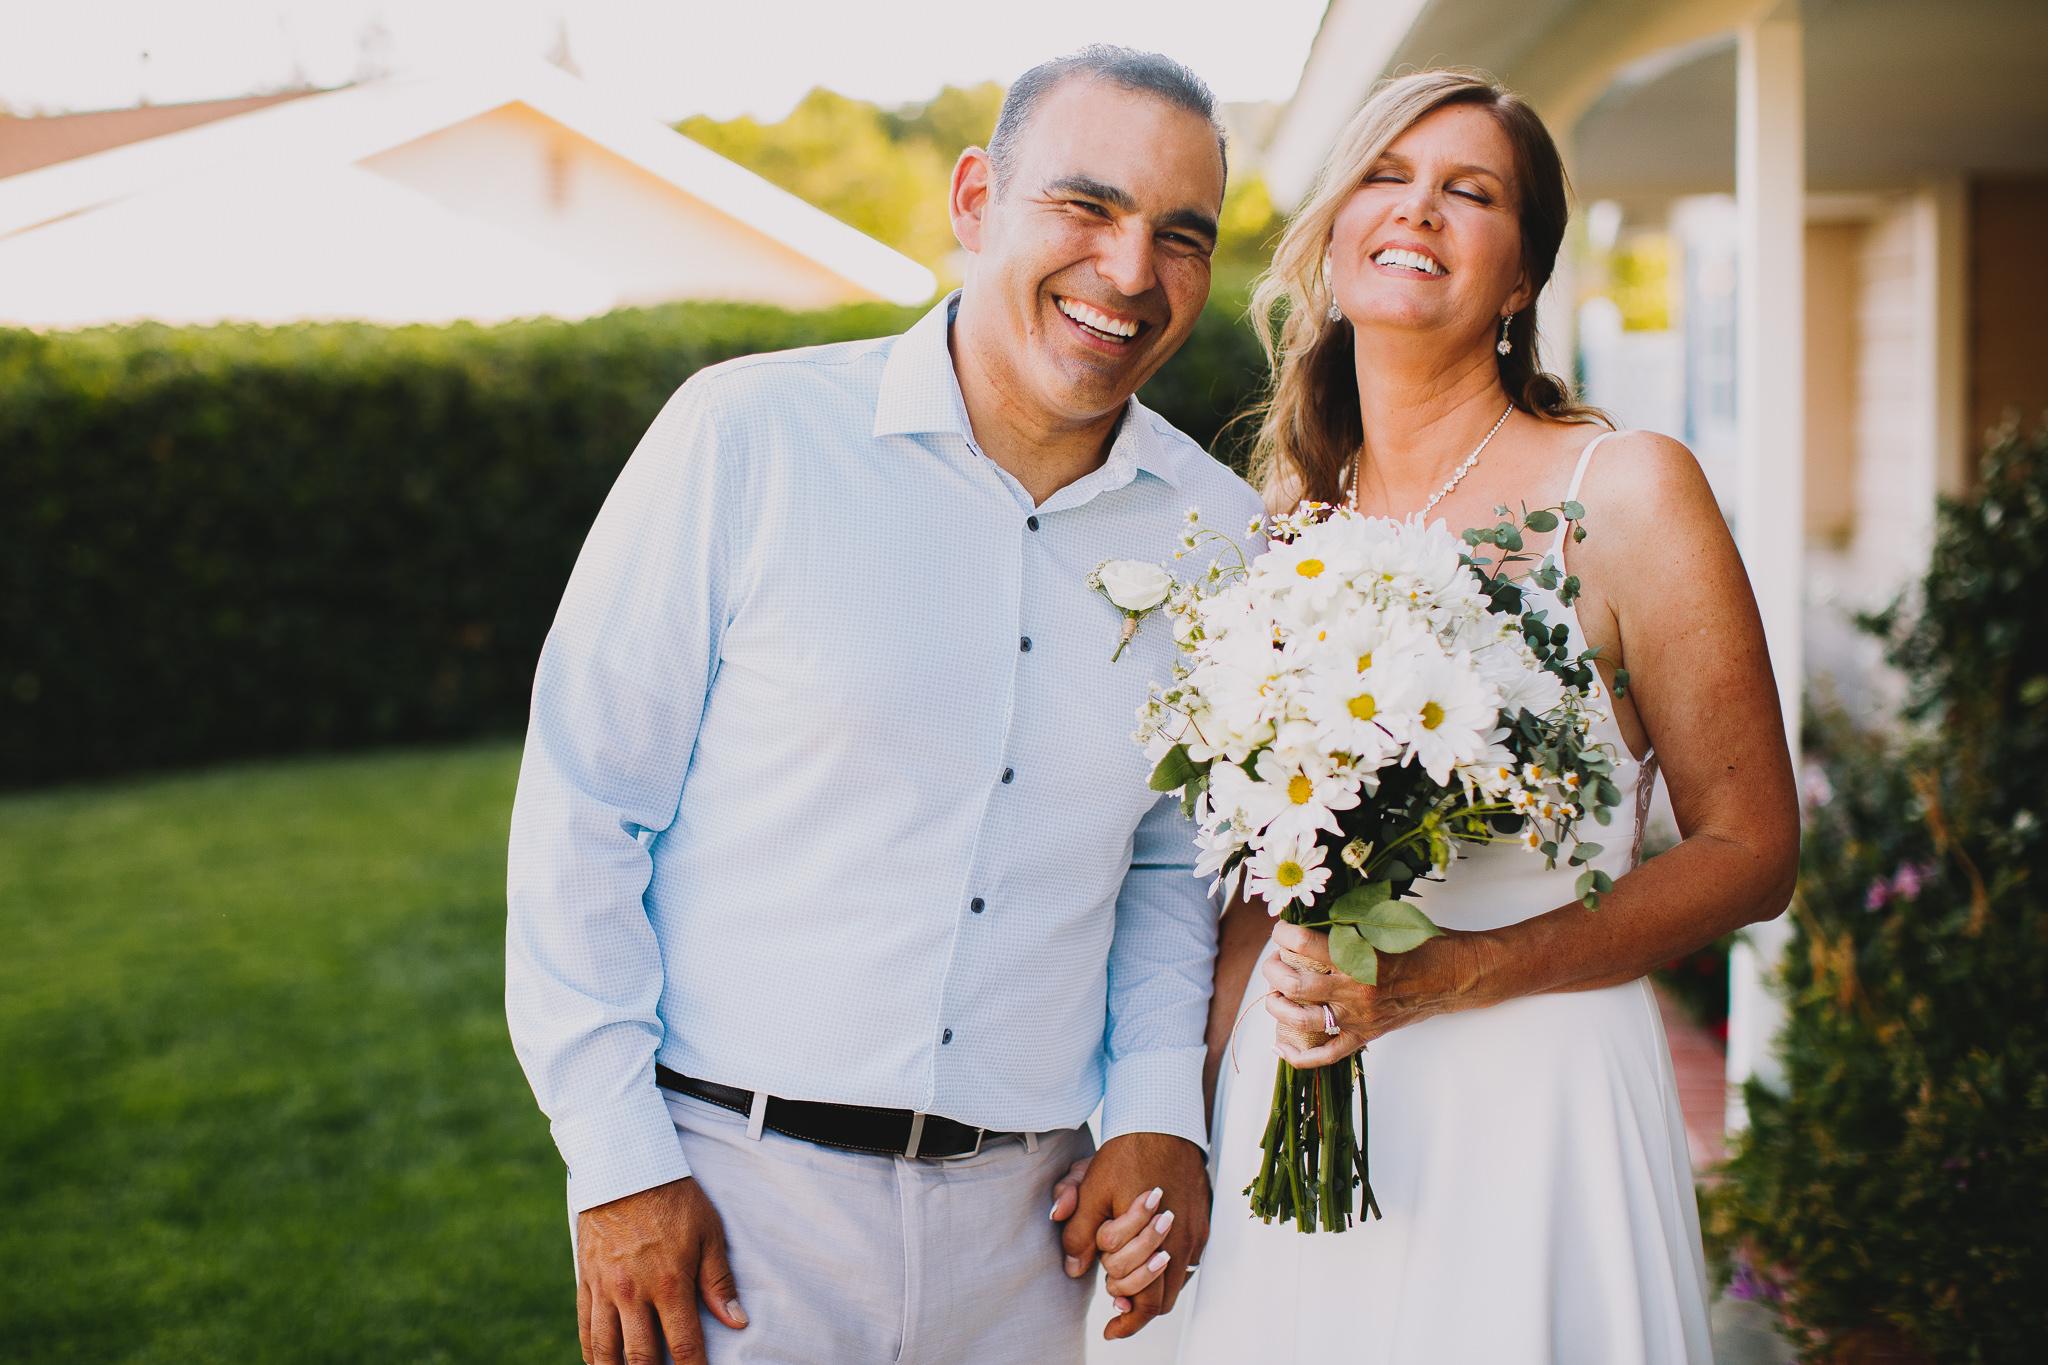 Archer Inspired Photography - Chatsworth California Los Angeles County SoCal Wedding Lifestyle Documentary Photographer-267.jpg